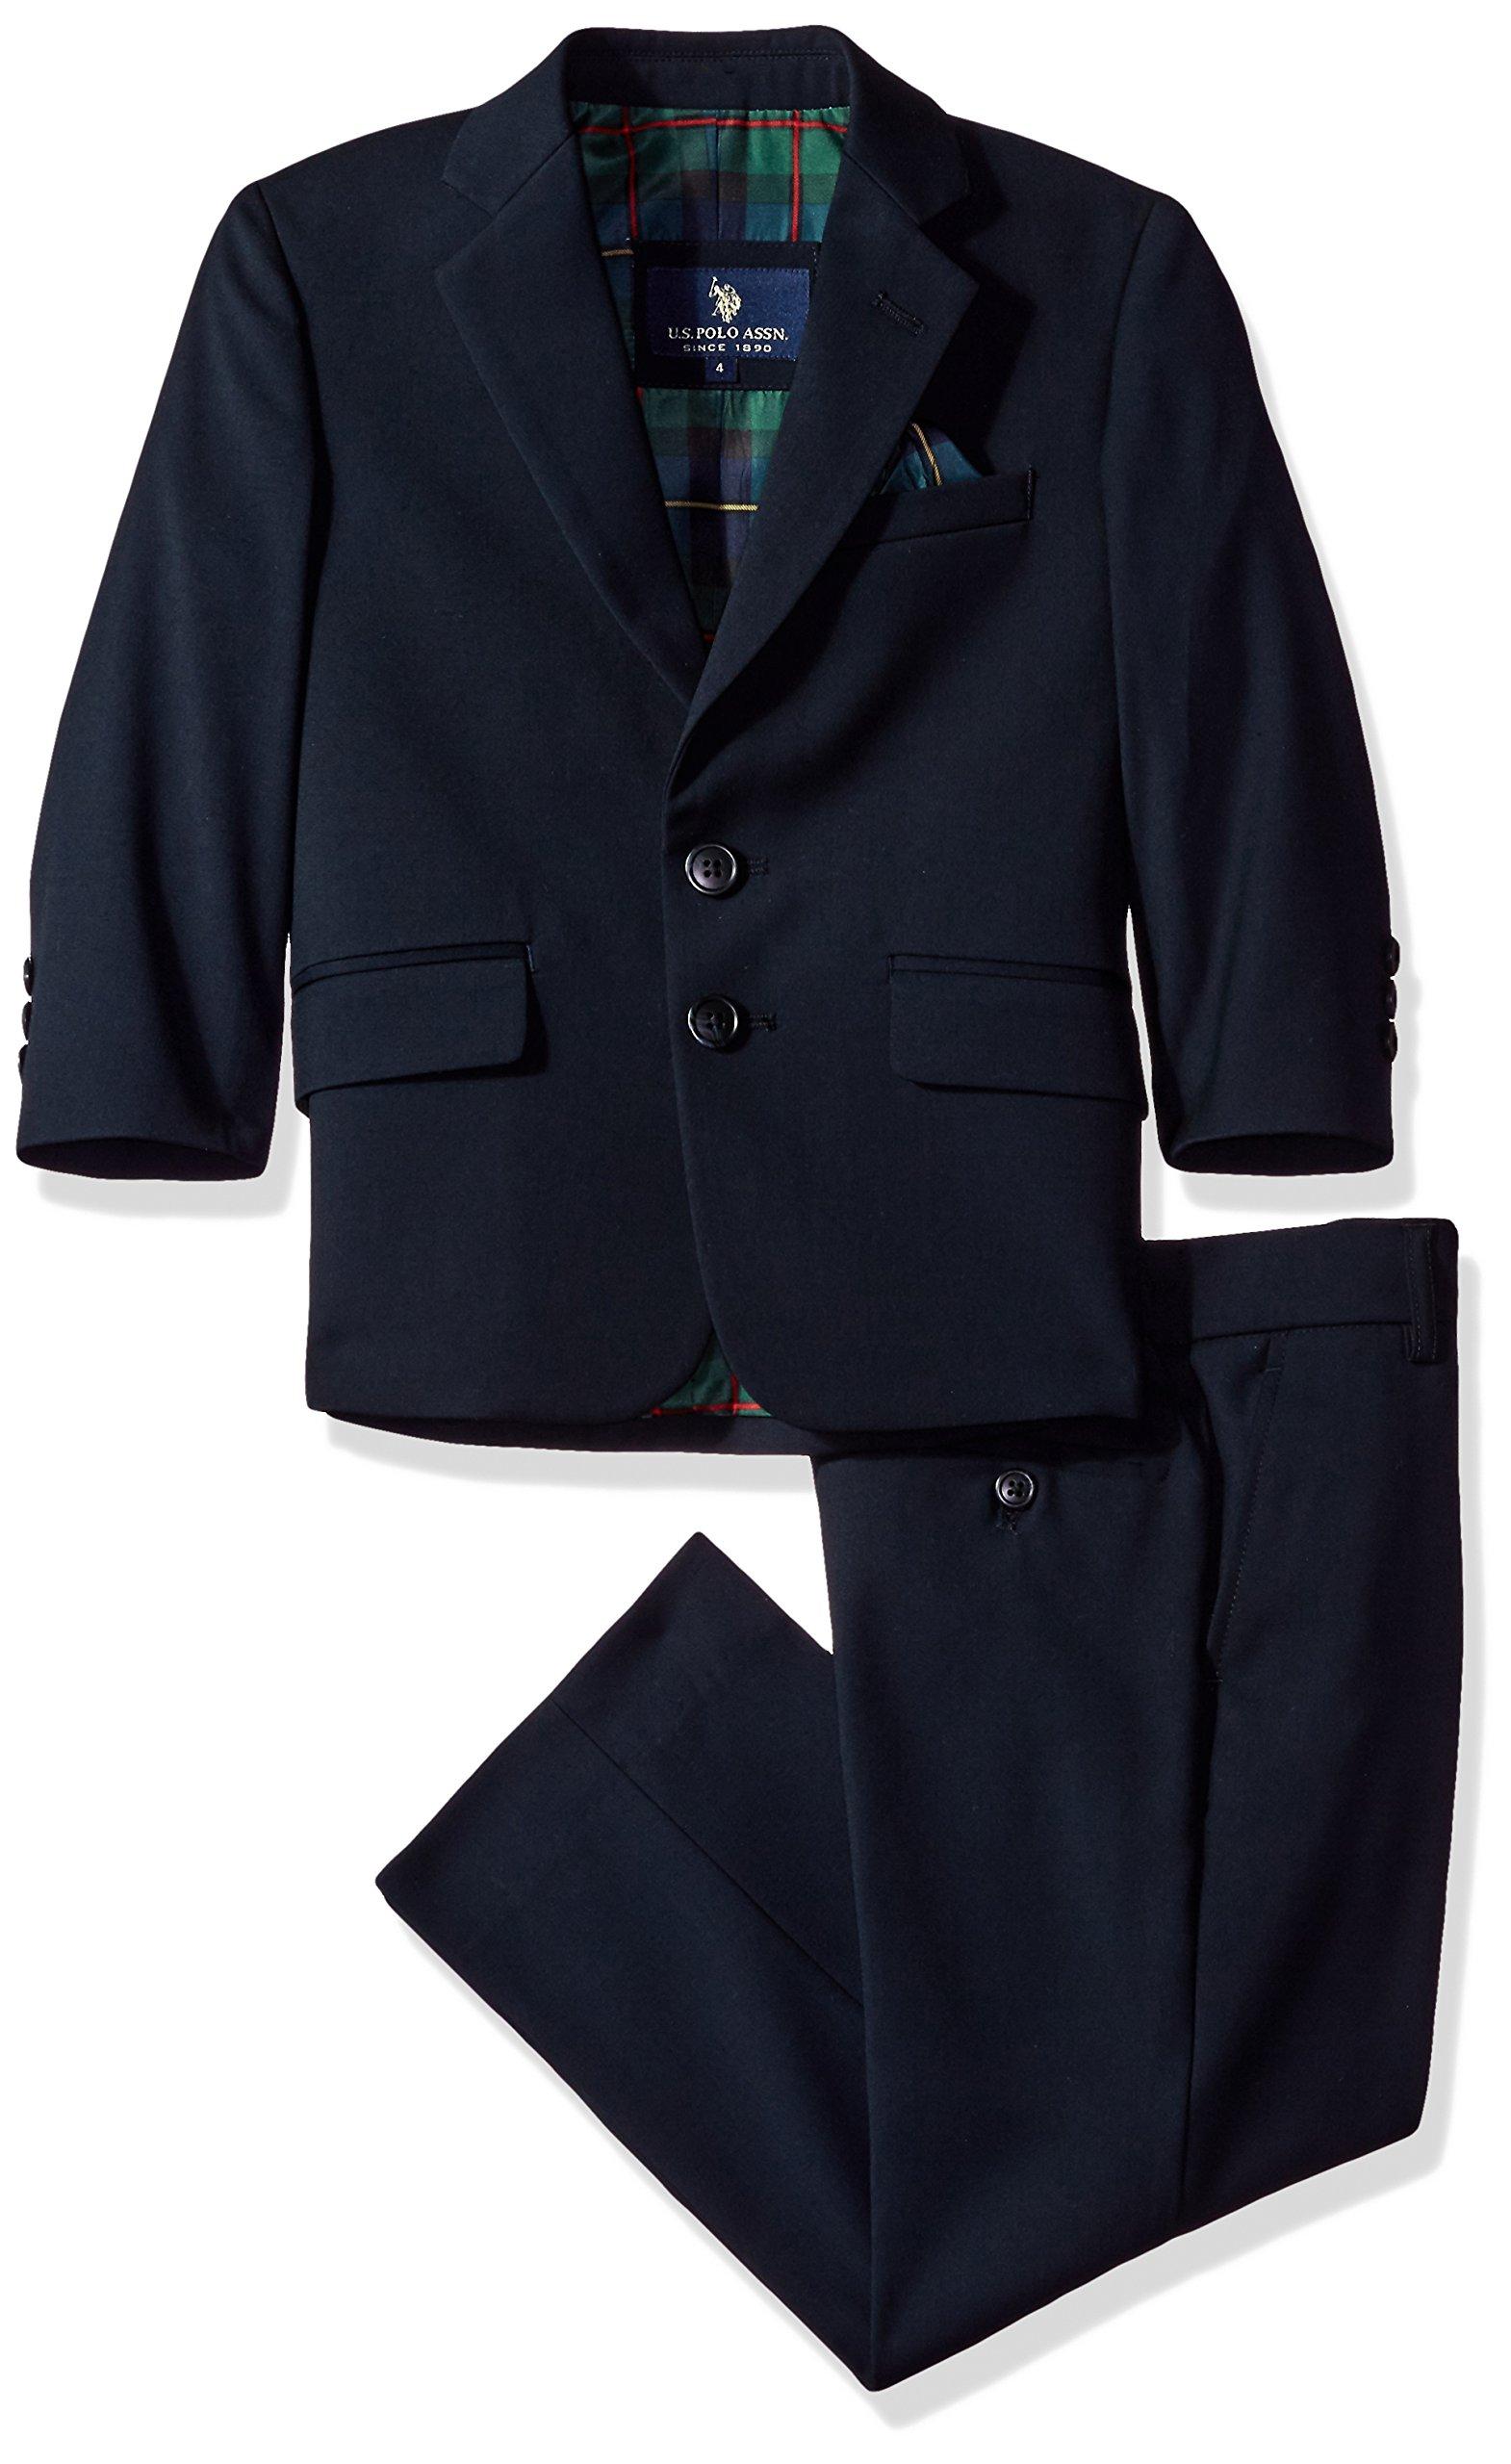 U.S. Polo Assn. Little Boys' Rayon Poly Suits, Navy, 5